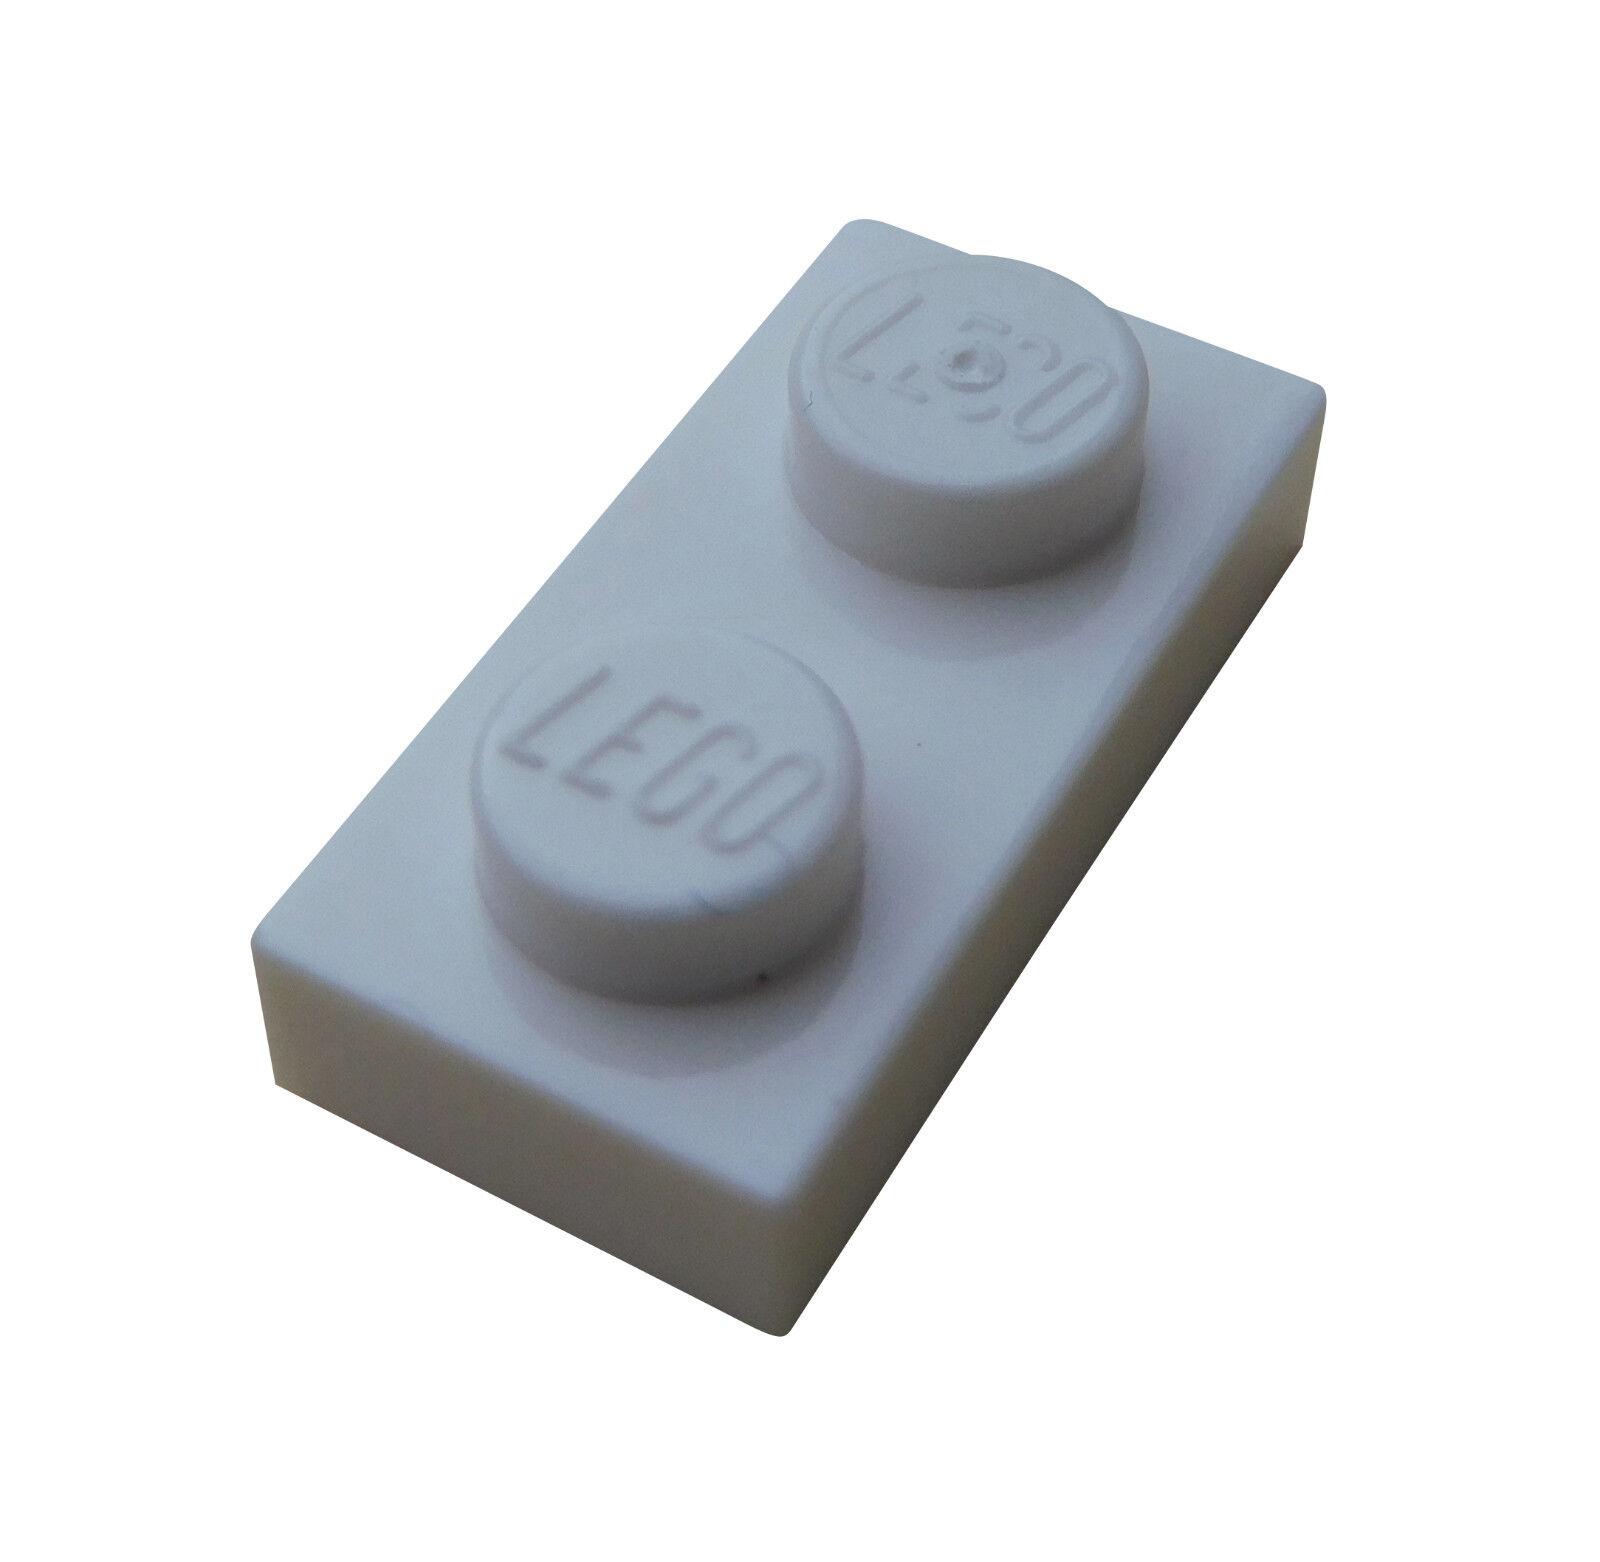 3023 Neu Platten in 1 x 2 City Lego 50 Stück Platte 1x2 dunkelblau dark blue